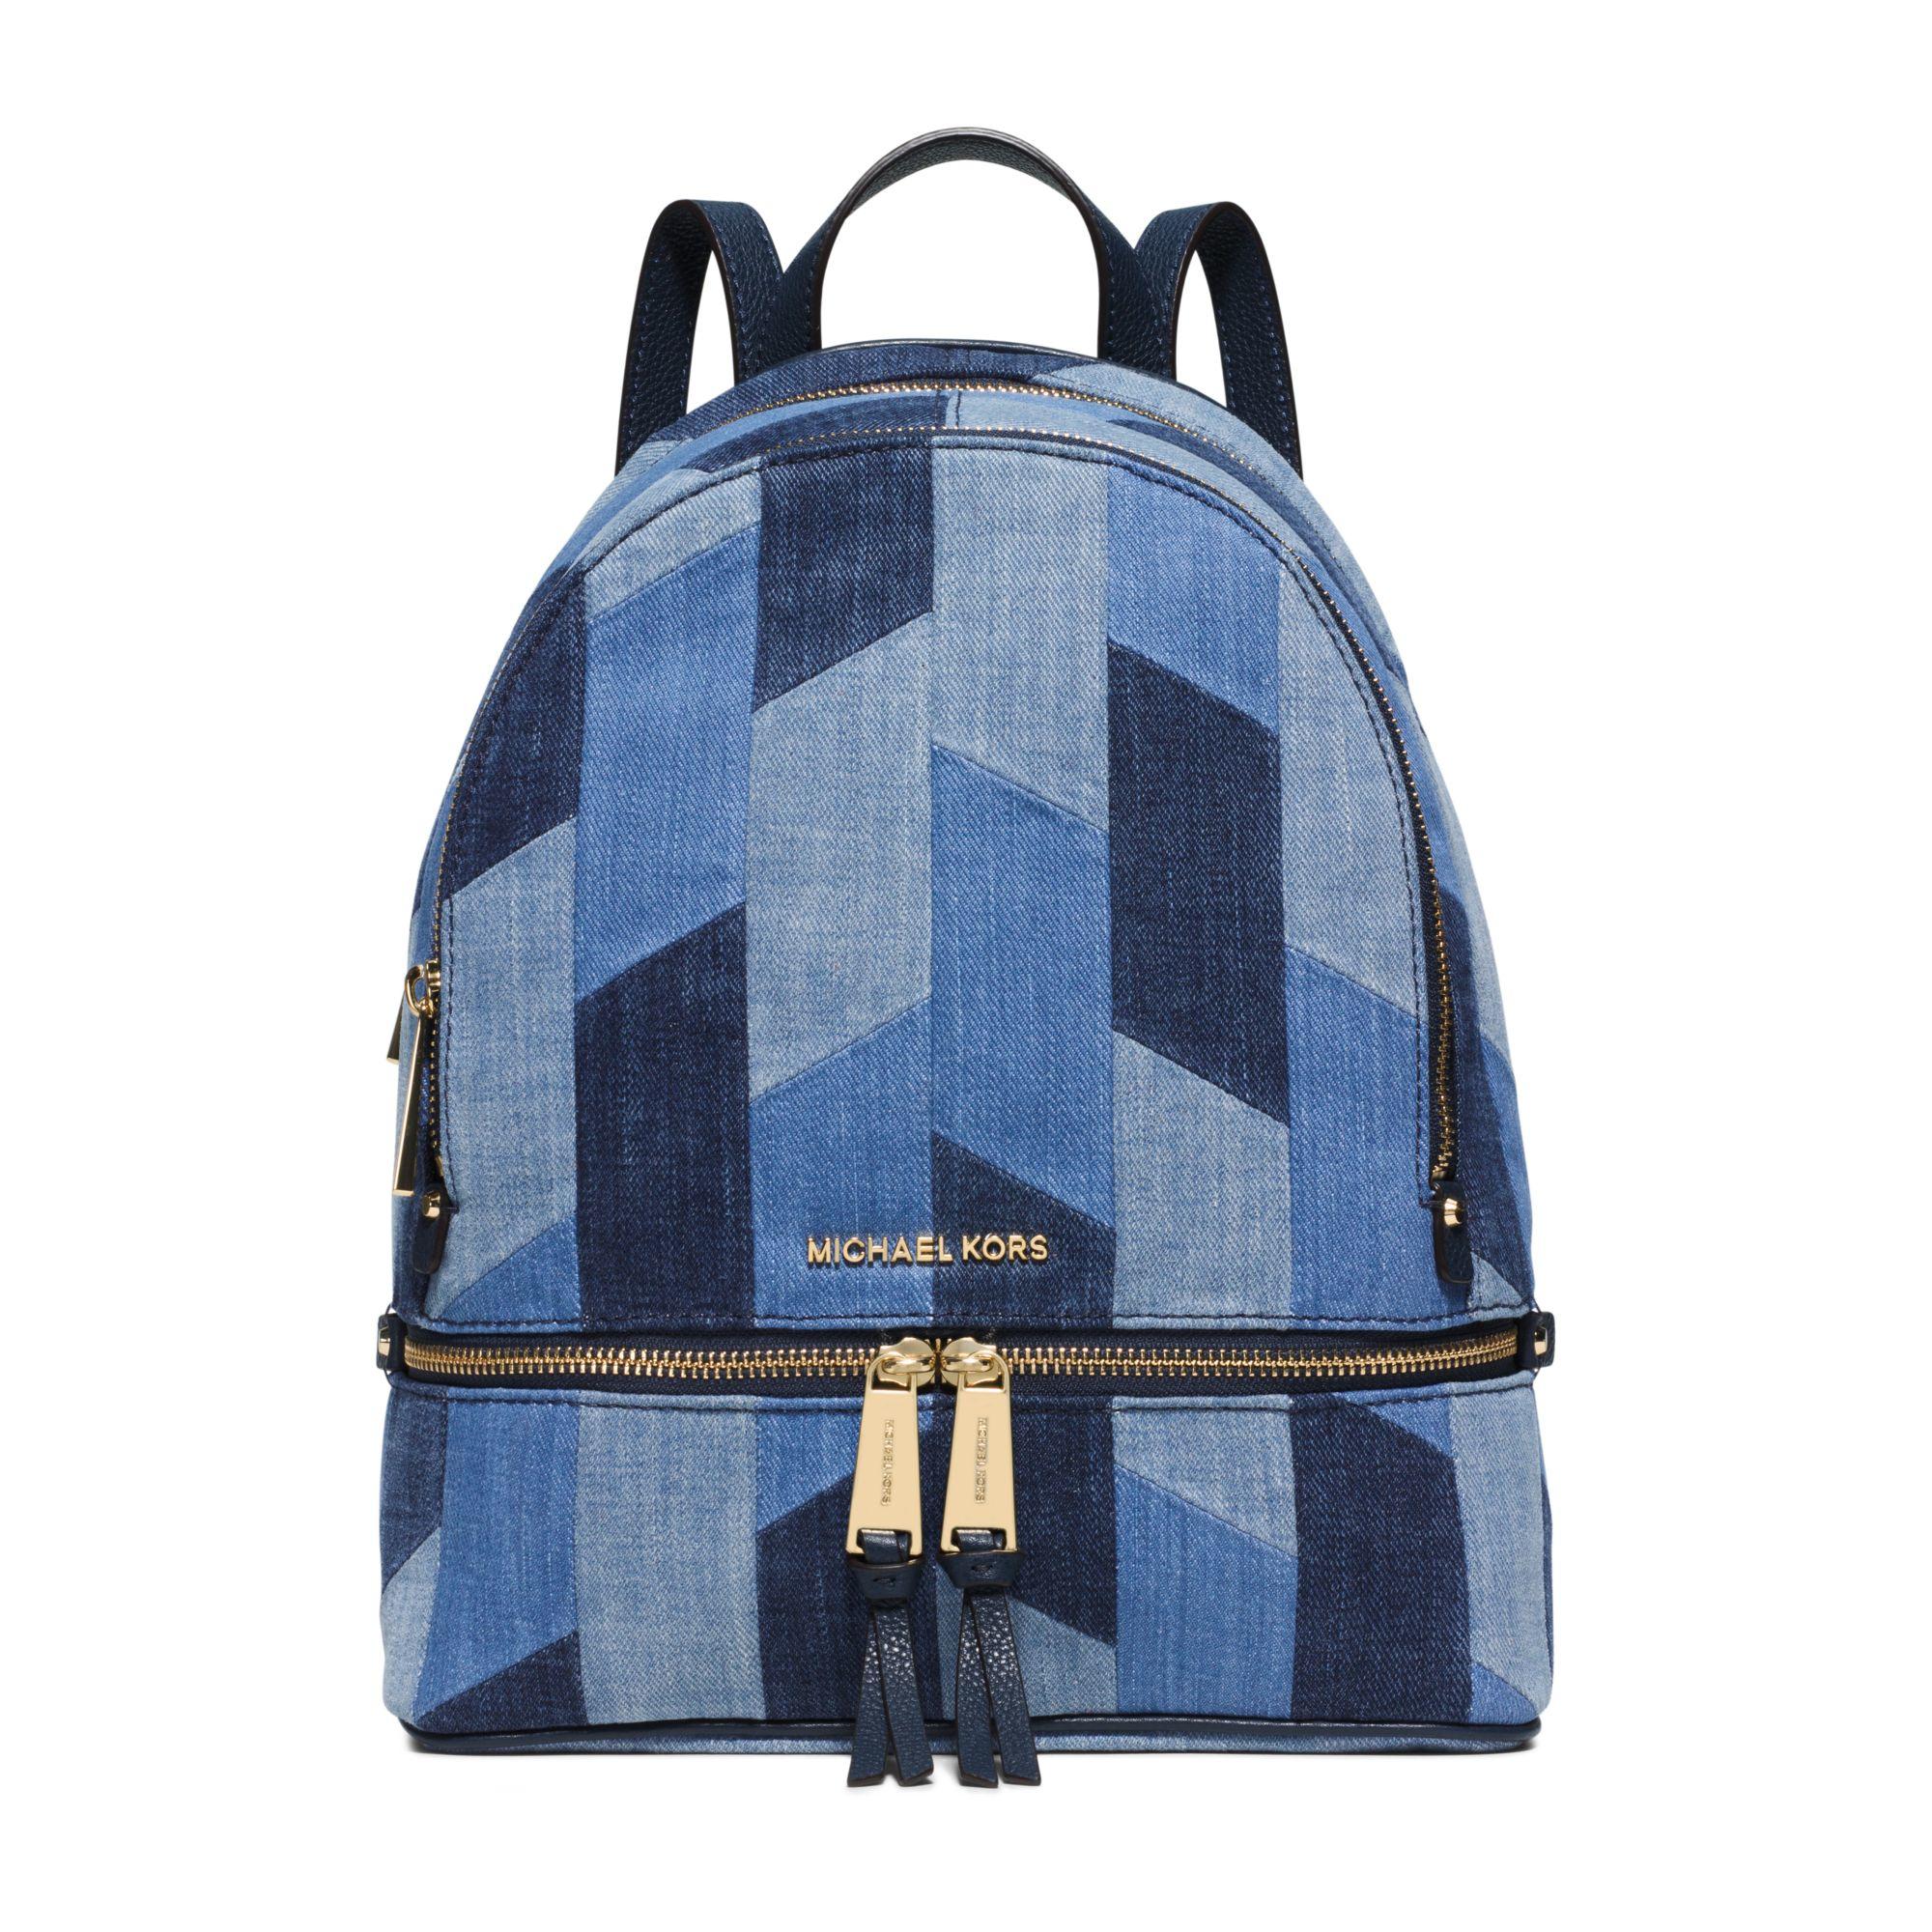 michael kors rhea medium mosaic patchwork denim backpack in blue lyst. Black Bedroom Furniture Sets. Home Design Ideas